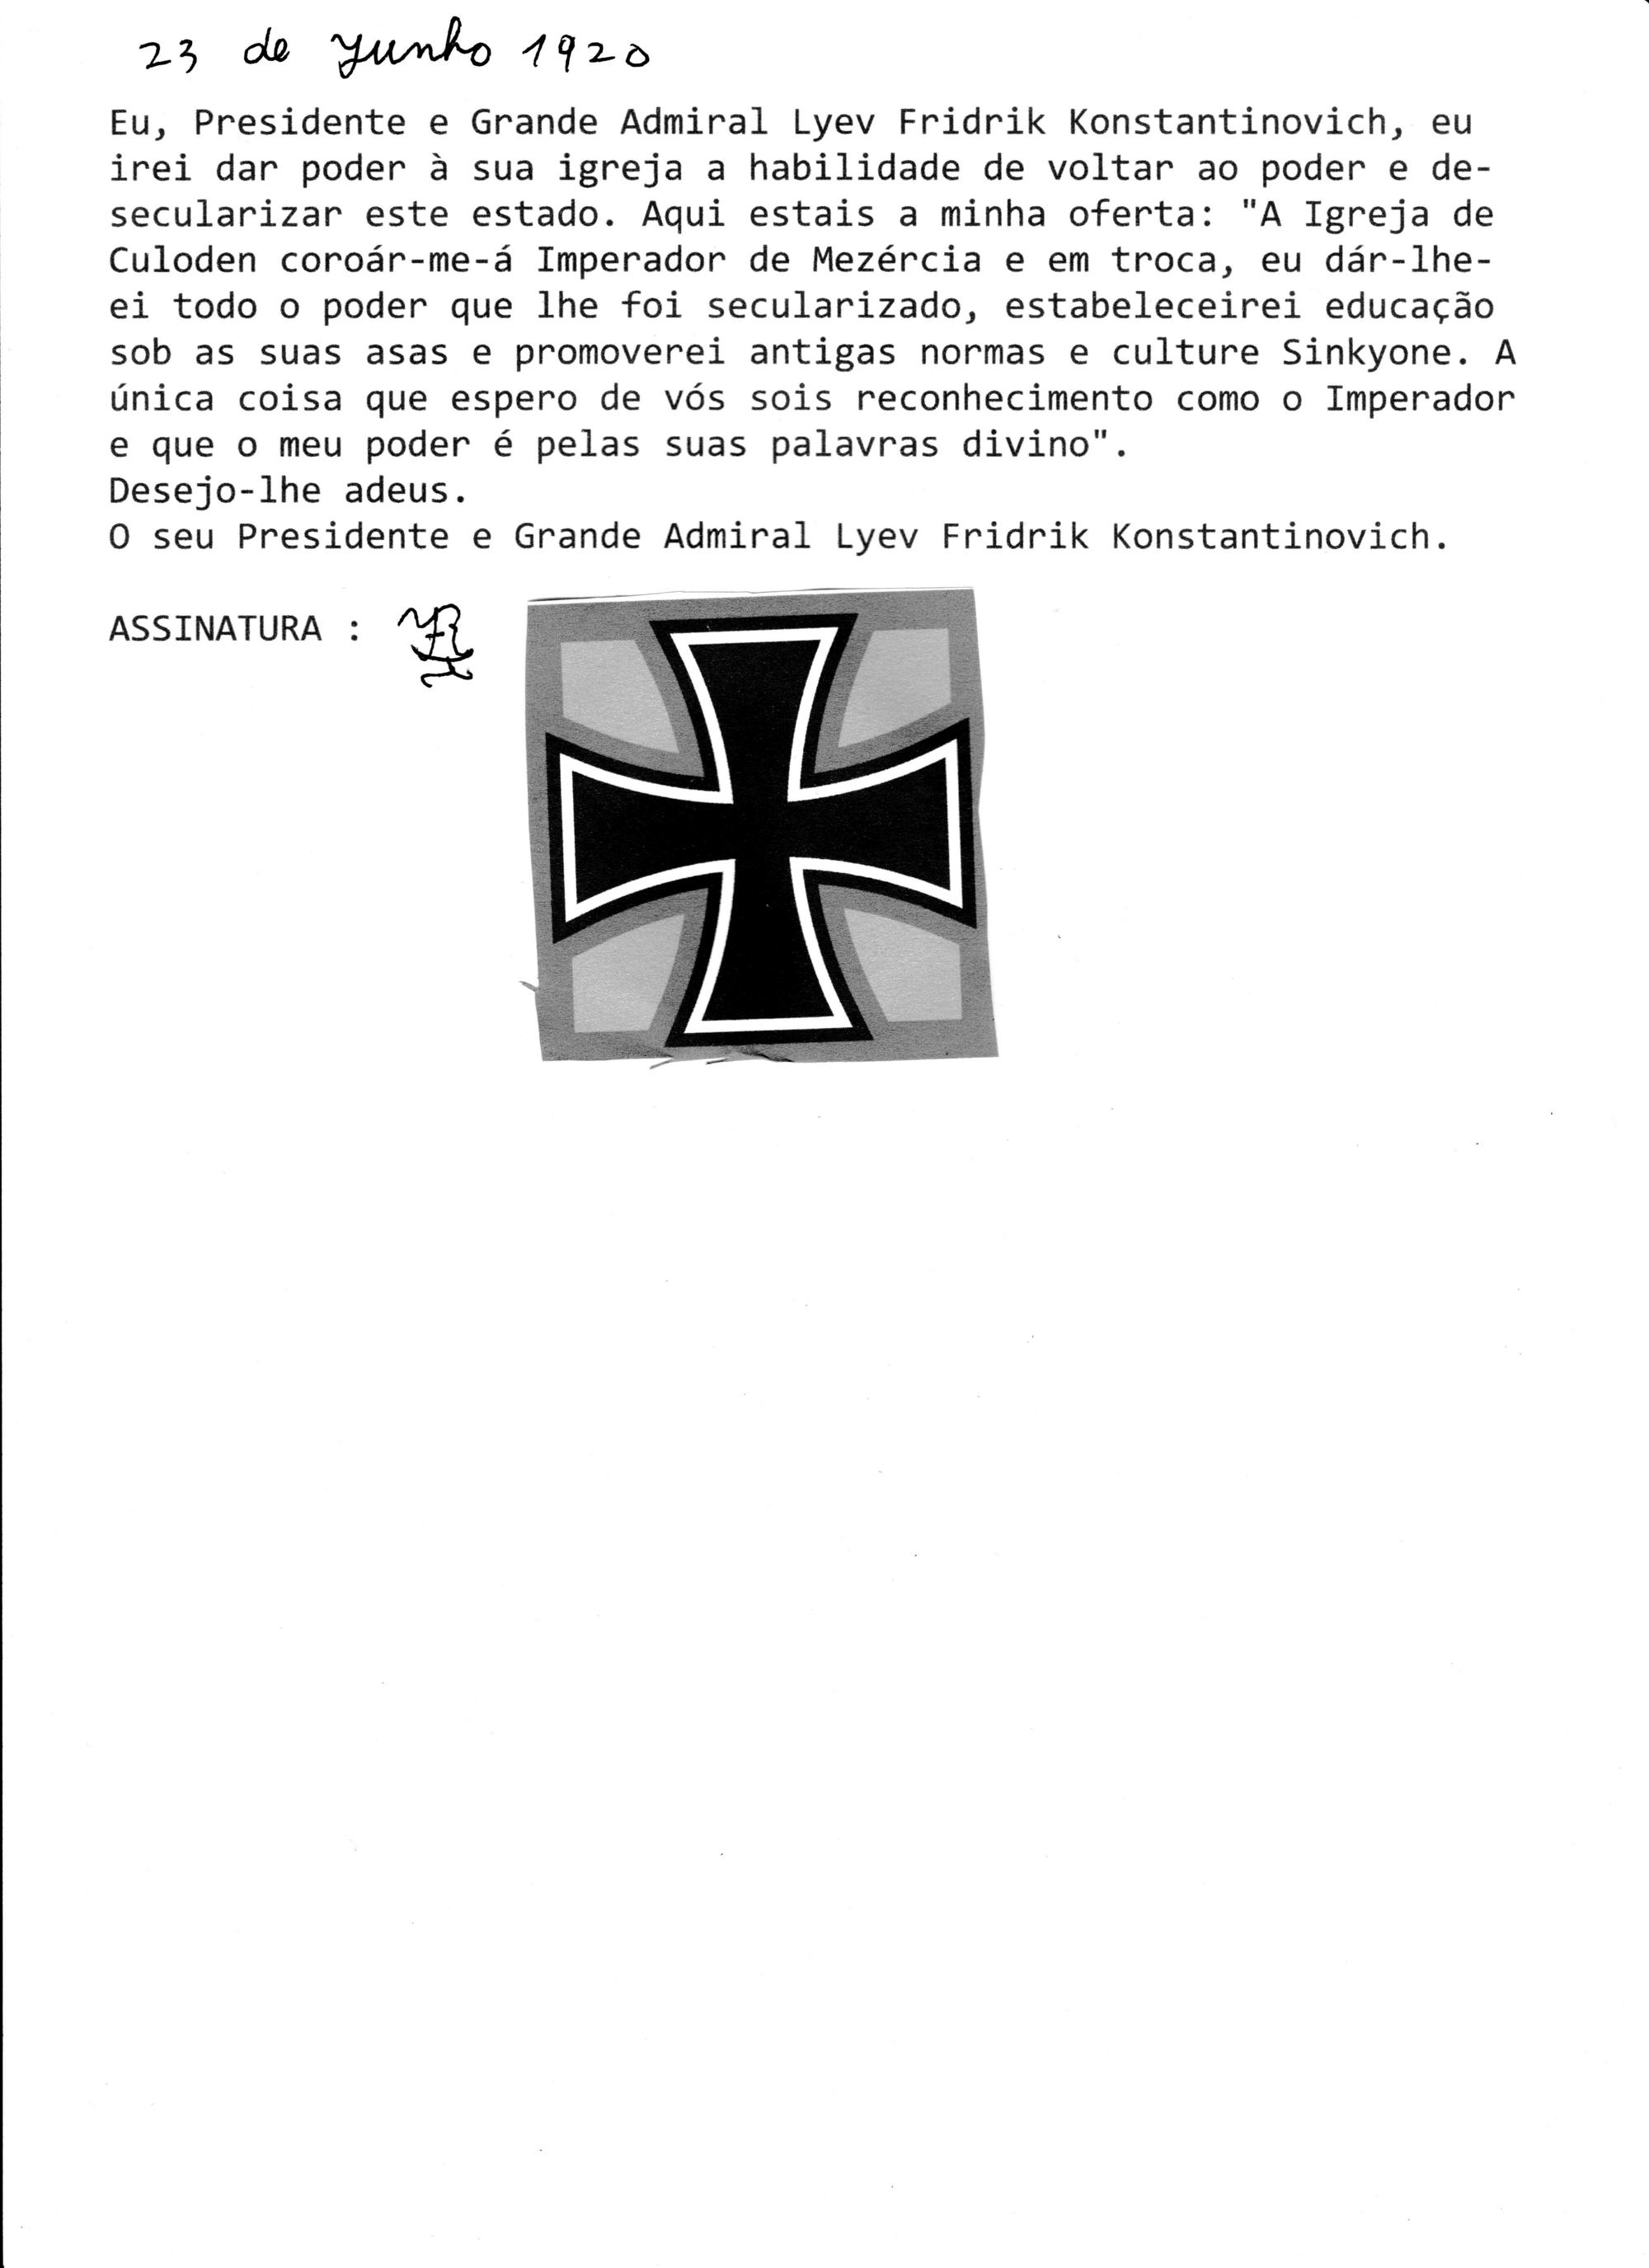 1920-1929 (Principia Moderni IV Map Game) | Alternative History